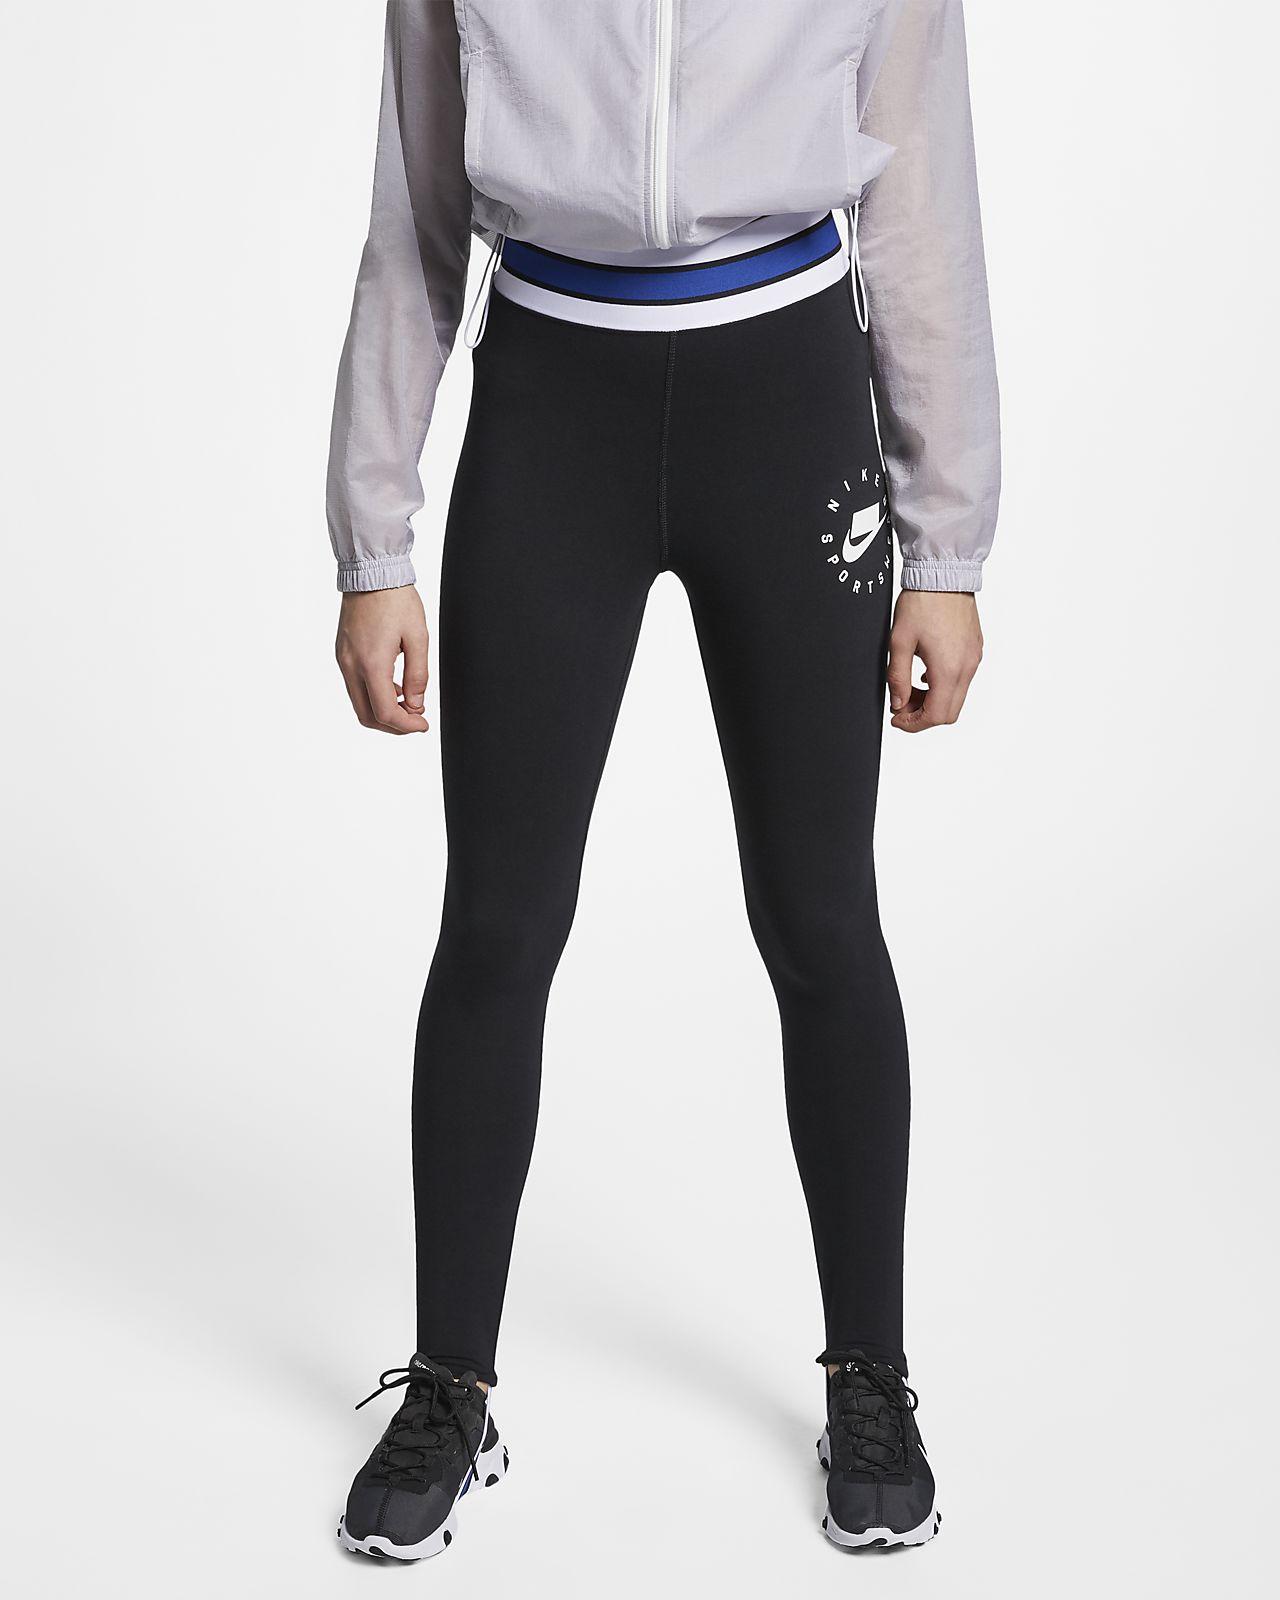 Sportswear Legging Femme Nike Nsw Pour nwX8OPk0